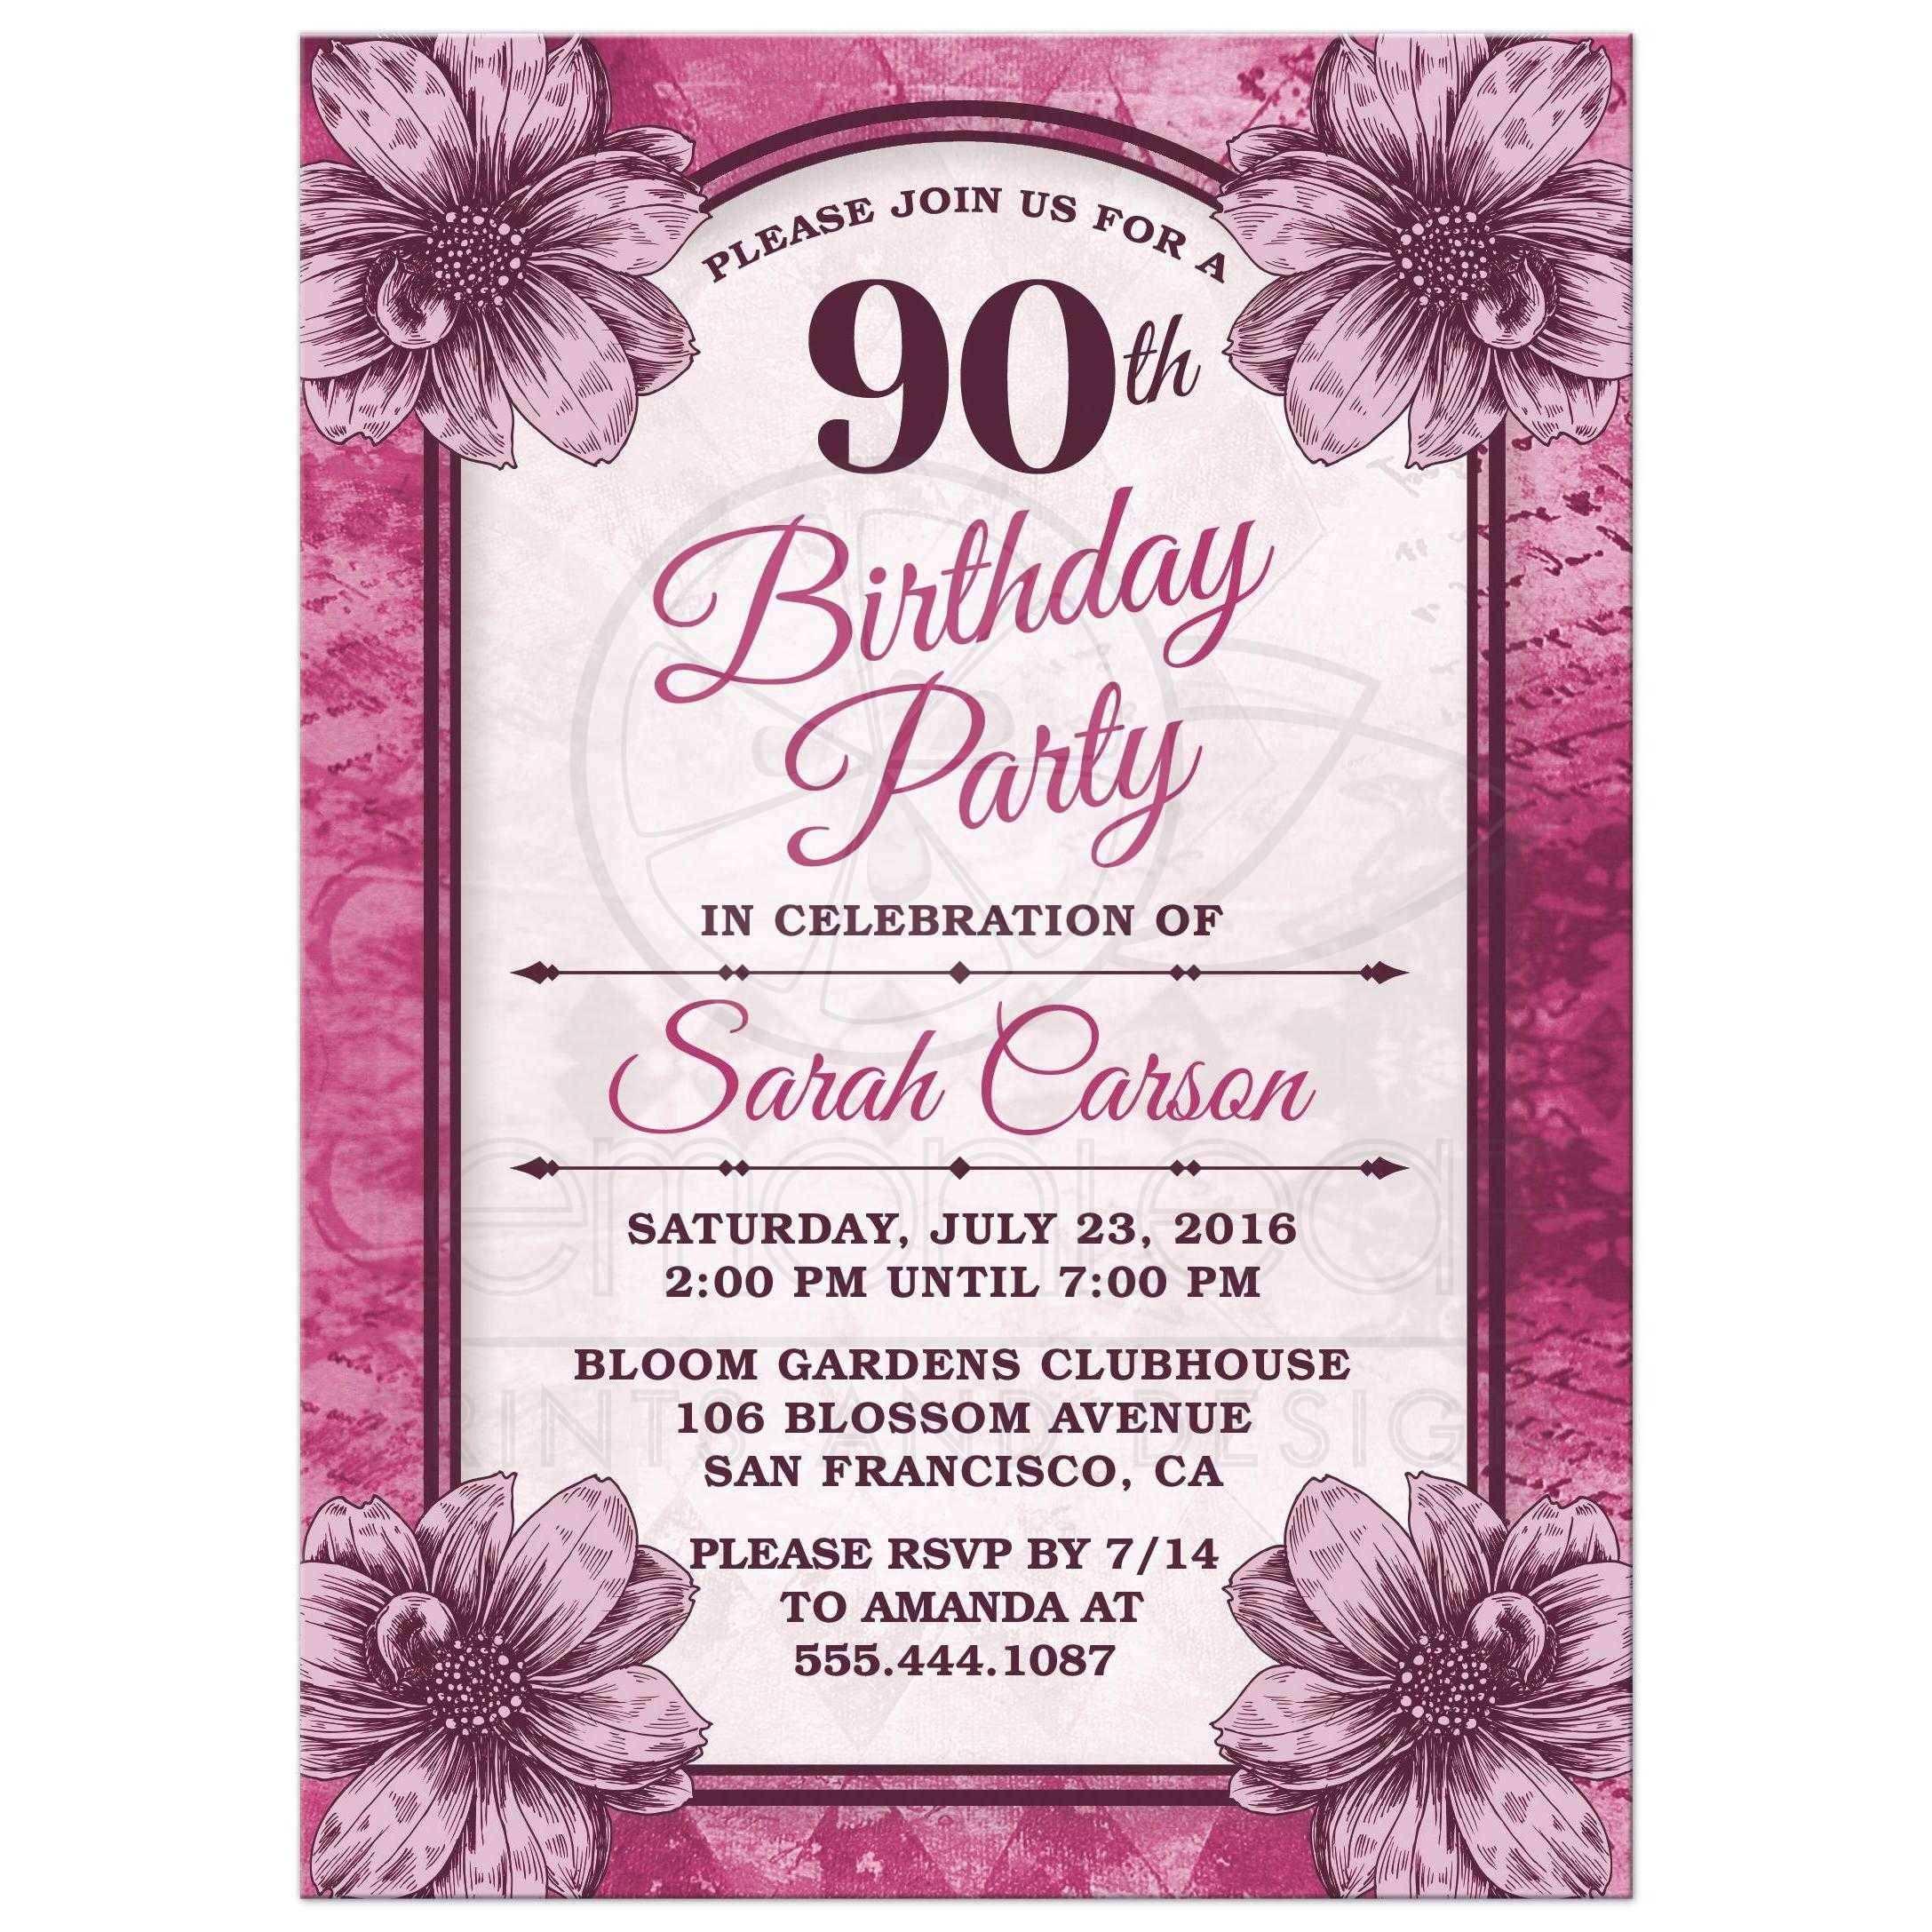 64 Adding Birthday Party Invitation Template Word Download by Birthday Party Invitation Template Word